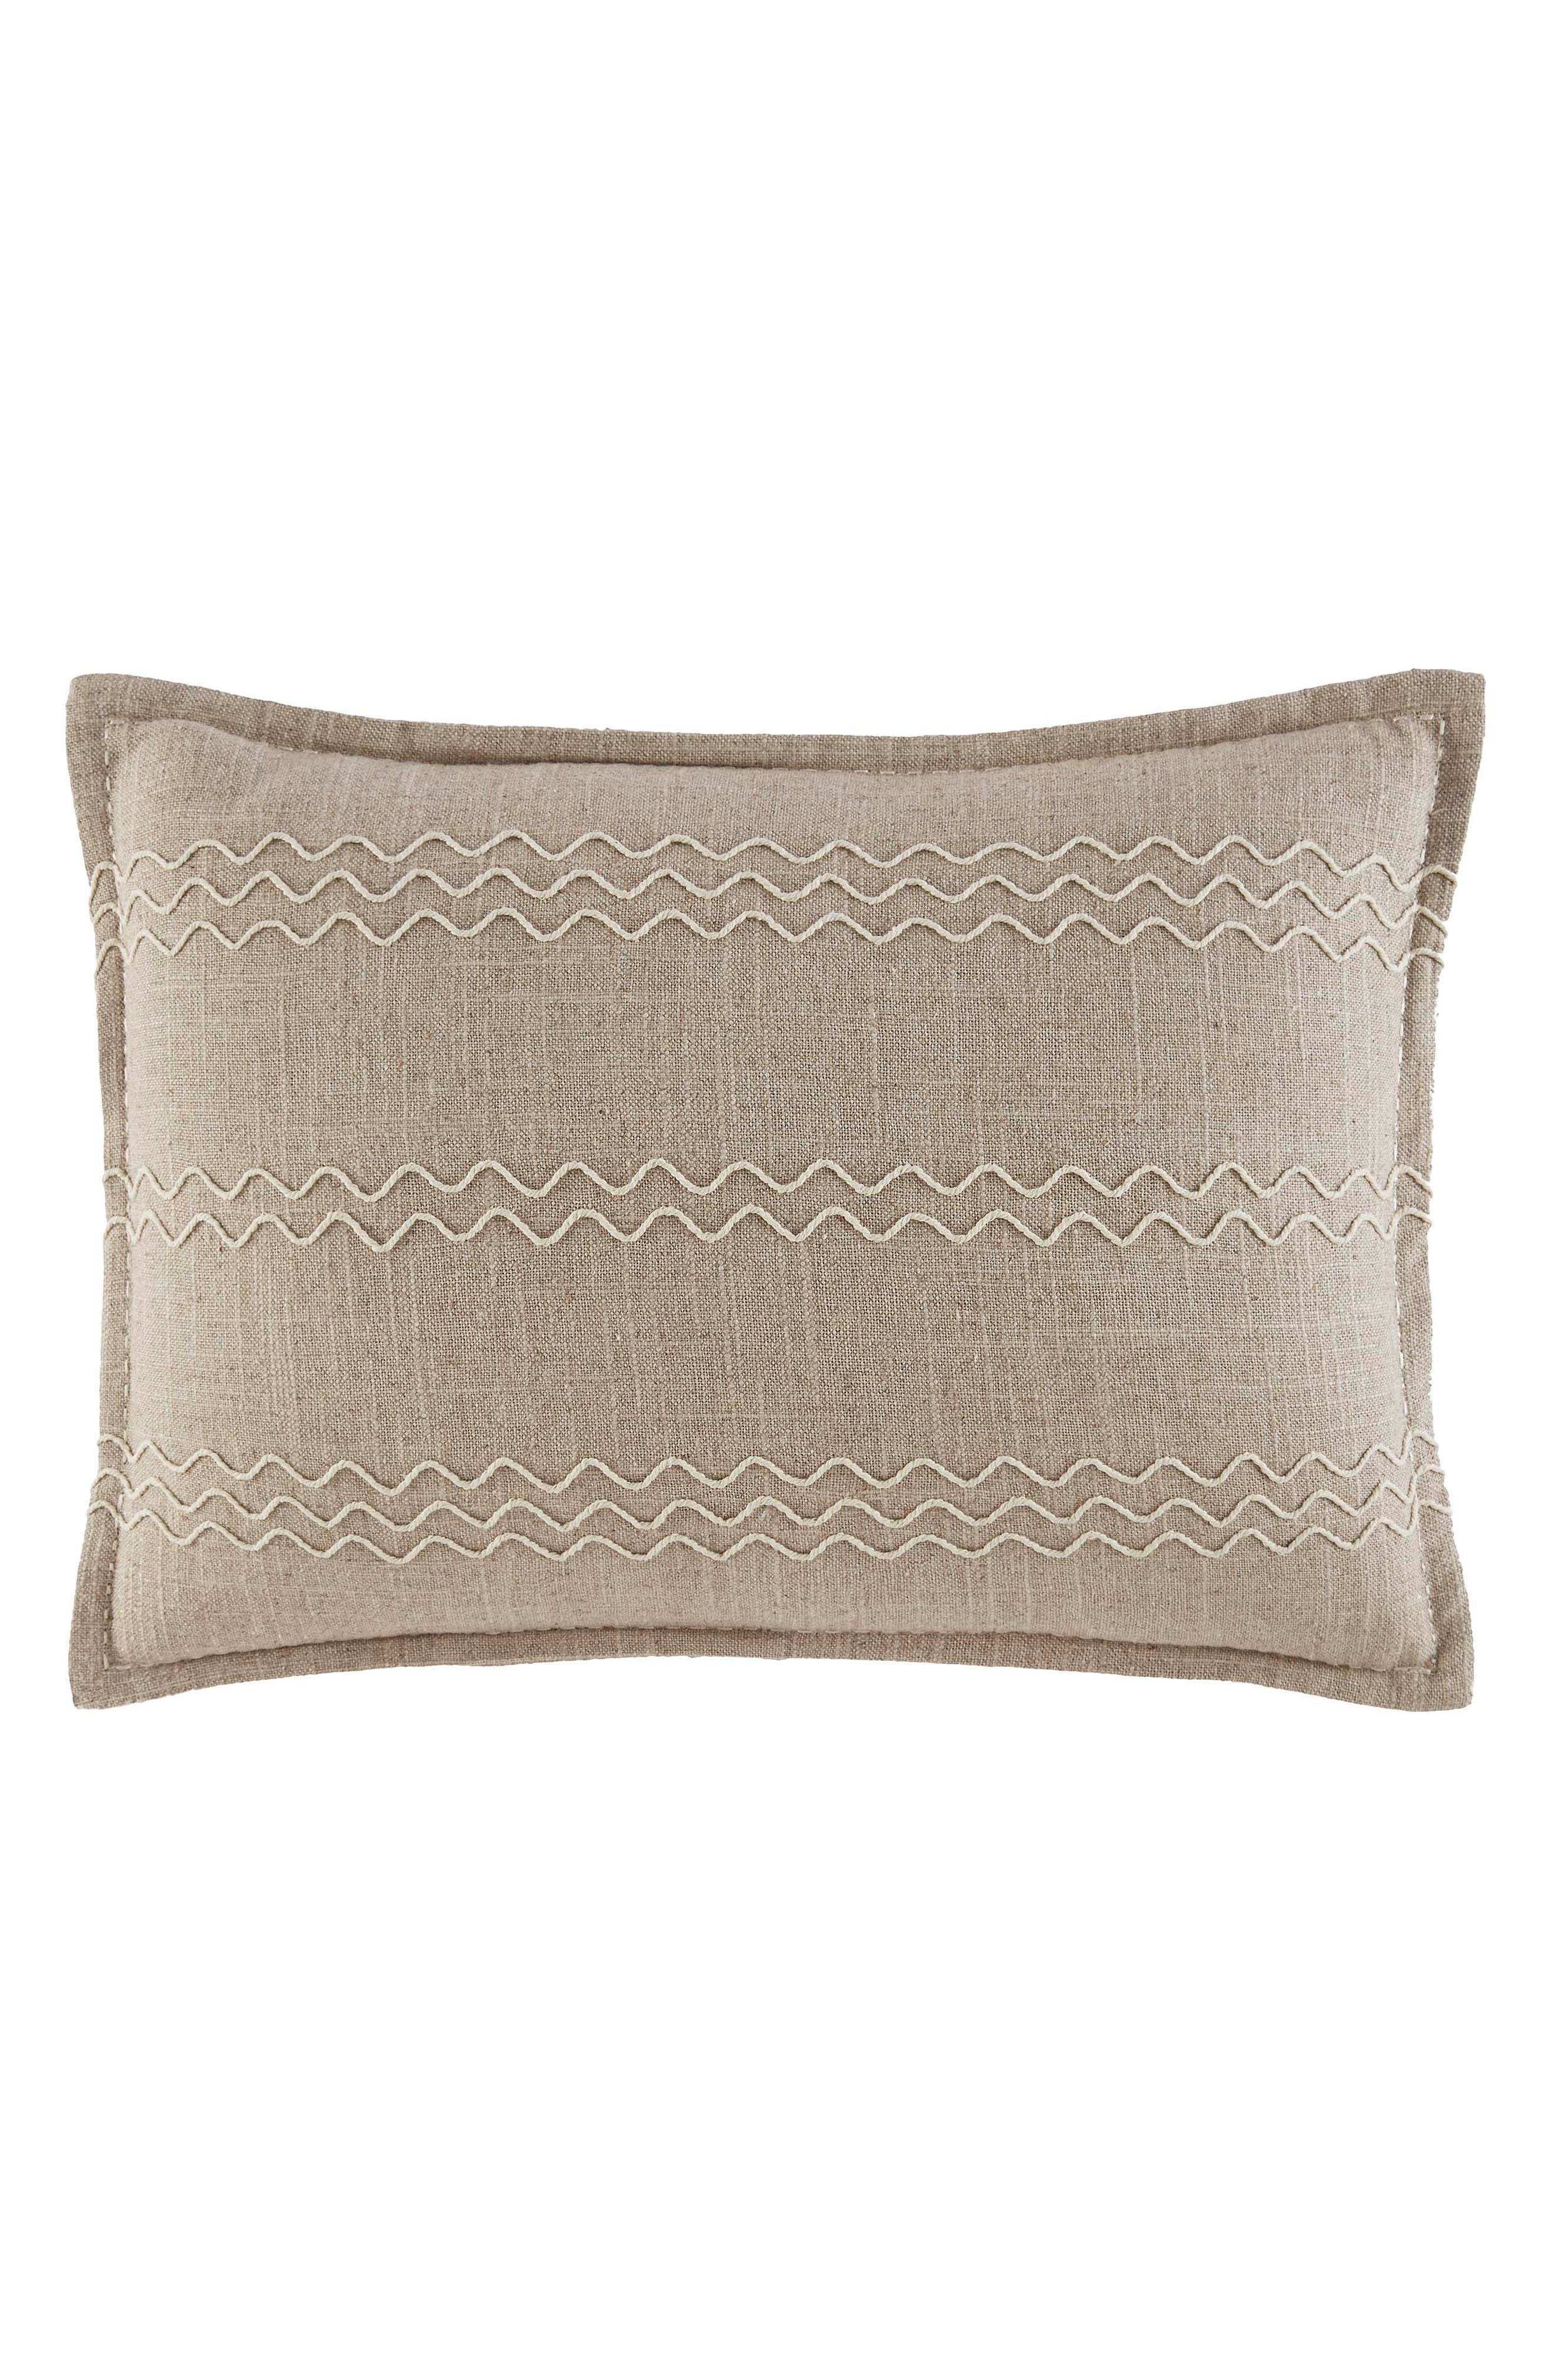 Mosaic Tile Pillow,                             Main thumbnail 1, color,                             250